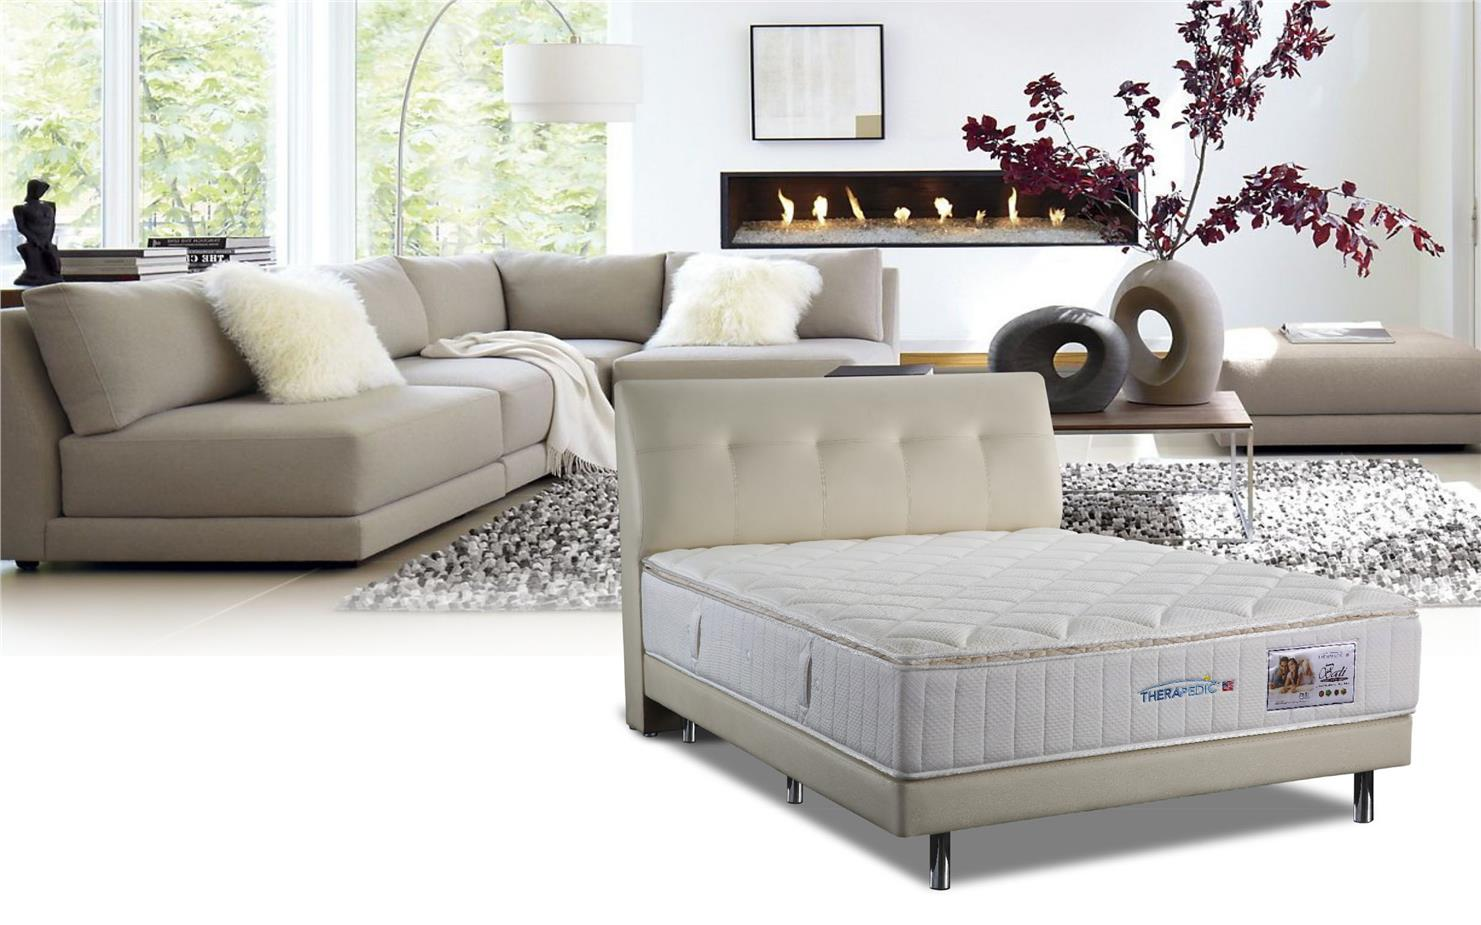 bali 5u0027 queen size aerofoam therapedic pocket spring mattress tilam